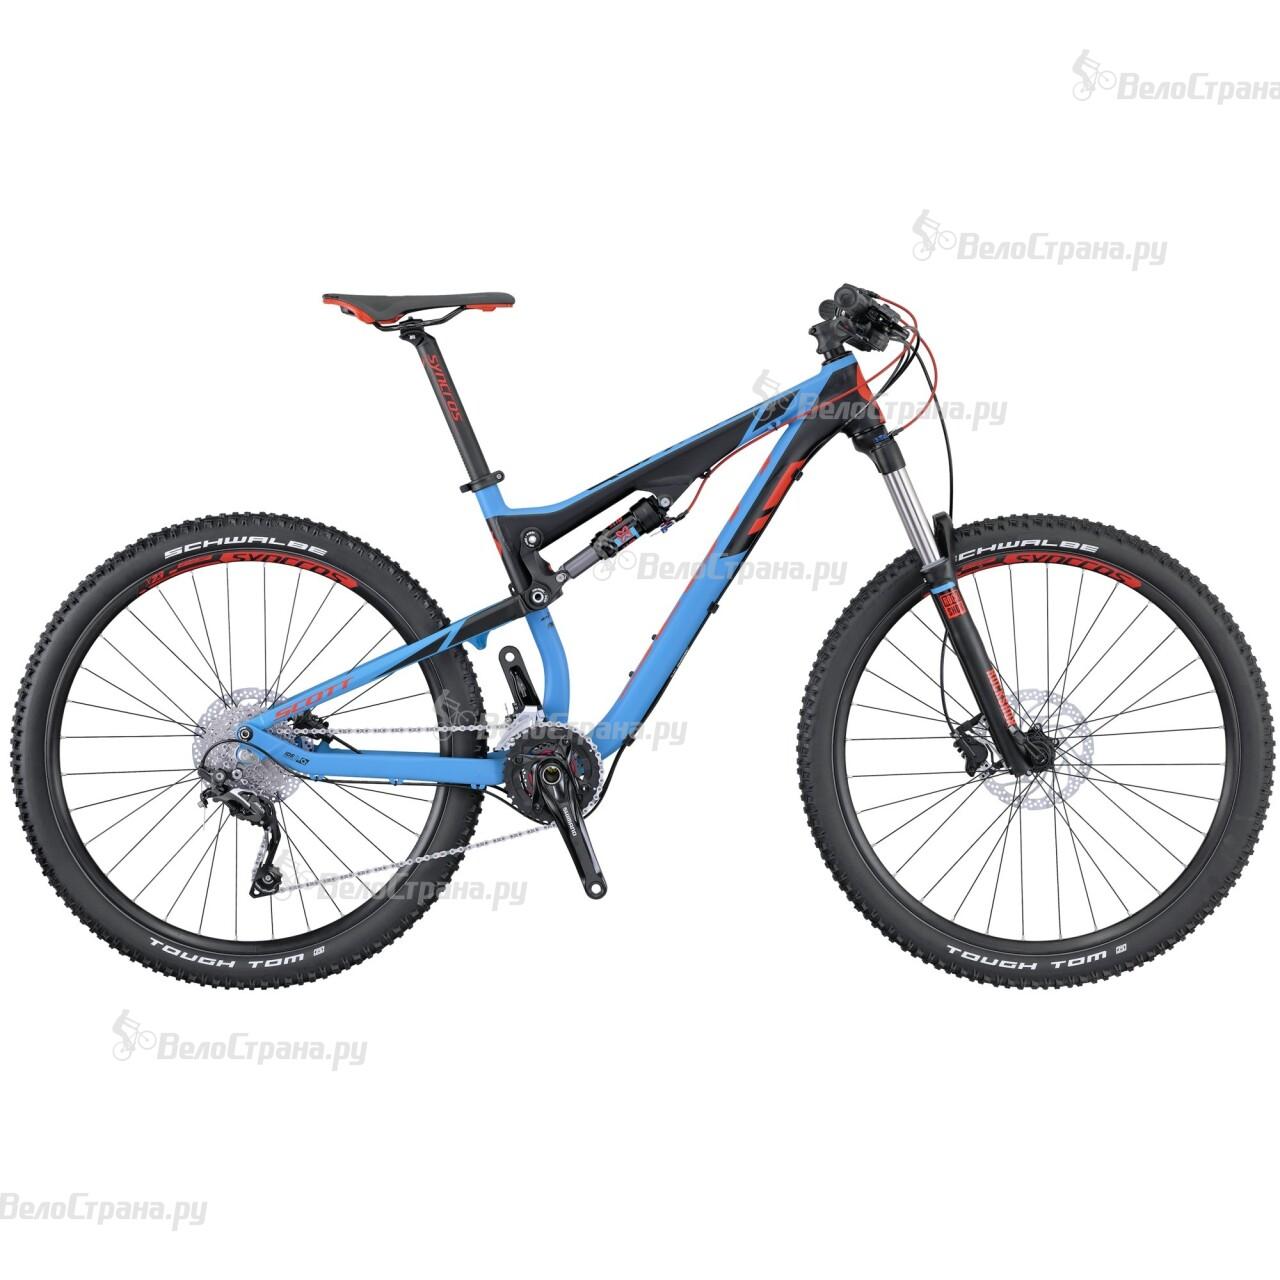 Велосипед Scott GENIUS 750 (2016) велосипед scott genius lt 700 tuned plus 2016